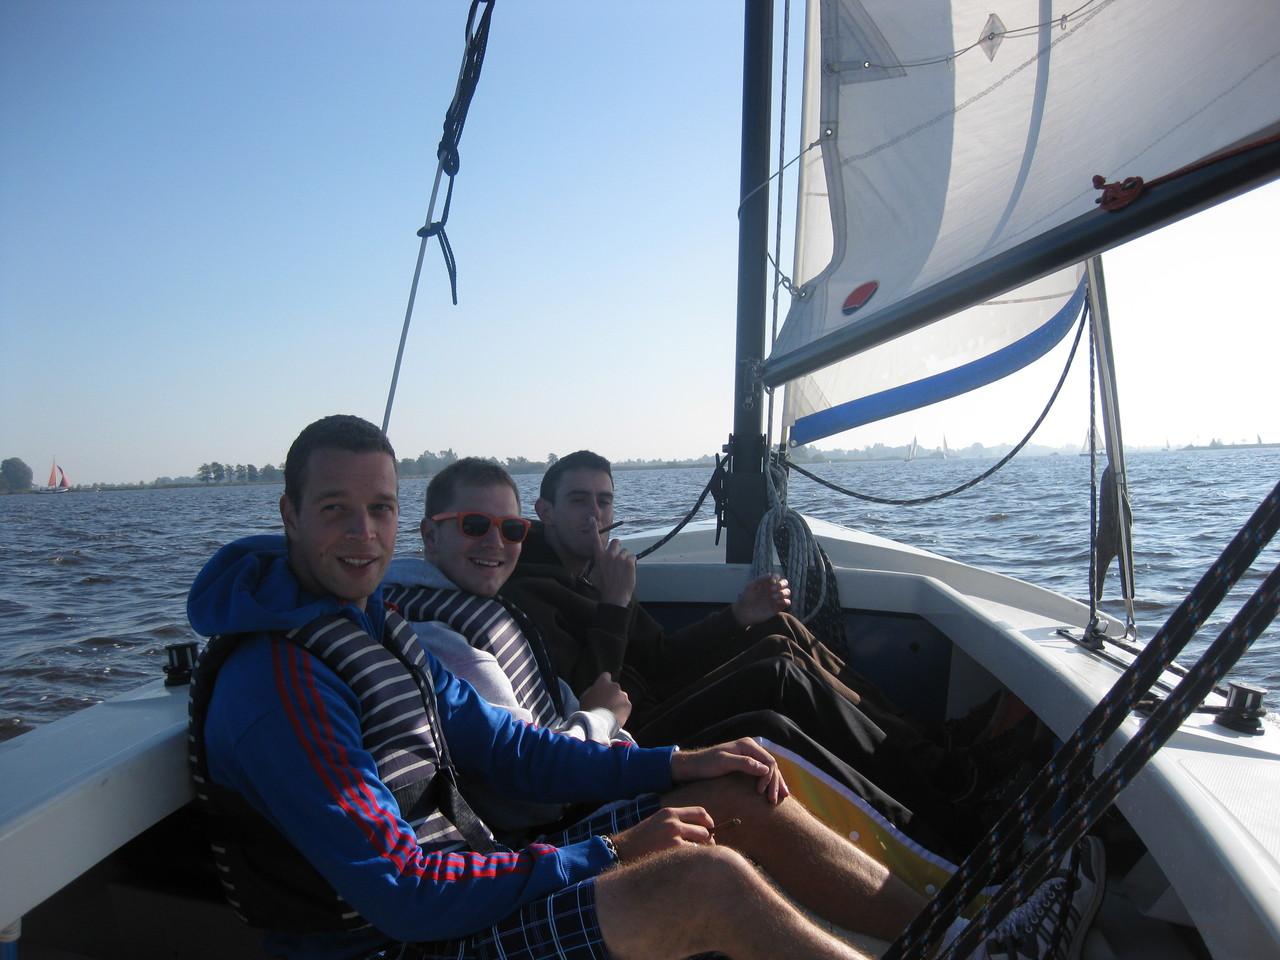 www.bungalowparkgarijp.nl - Segelboot mieten